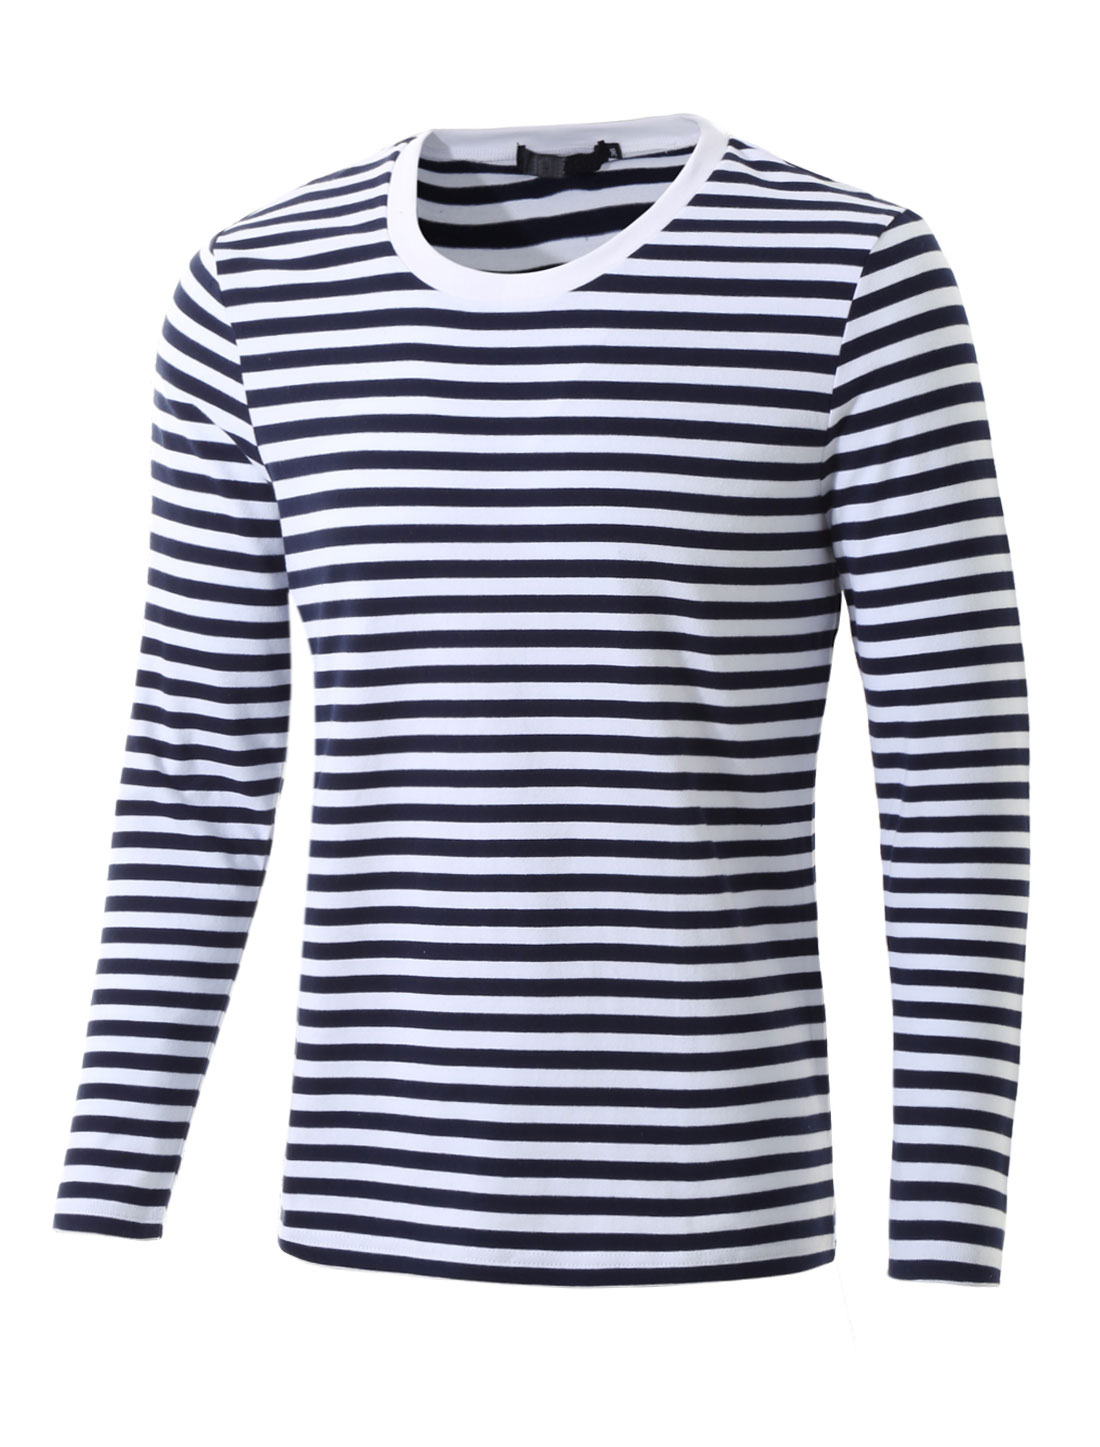 Men Crew Neck Long Sleeve Striped Tee T Shirt Navy Blue L L (US 44)